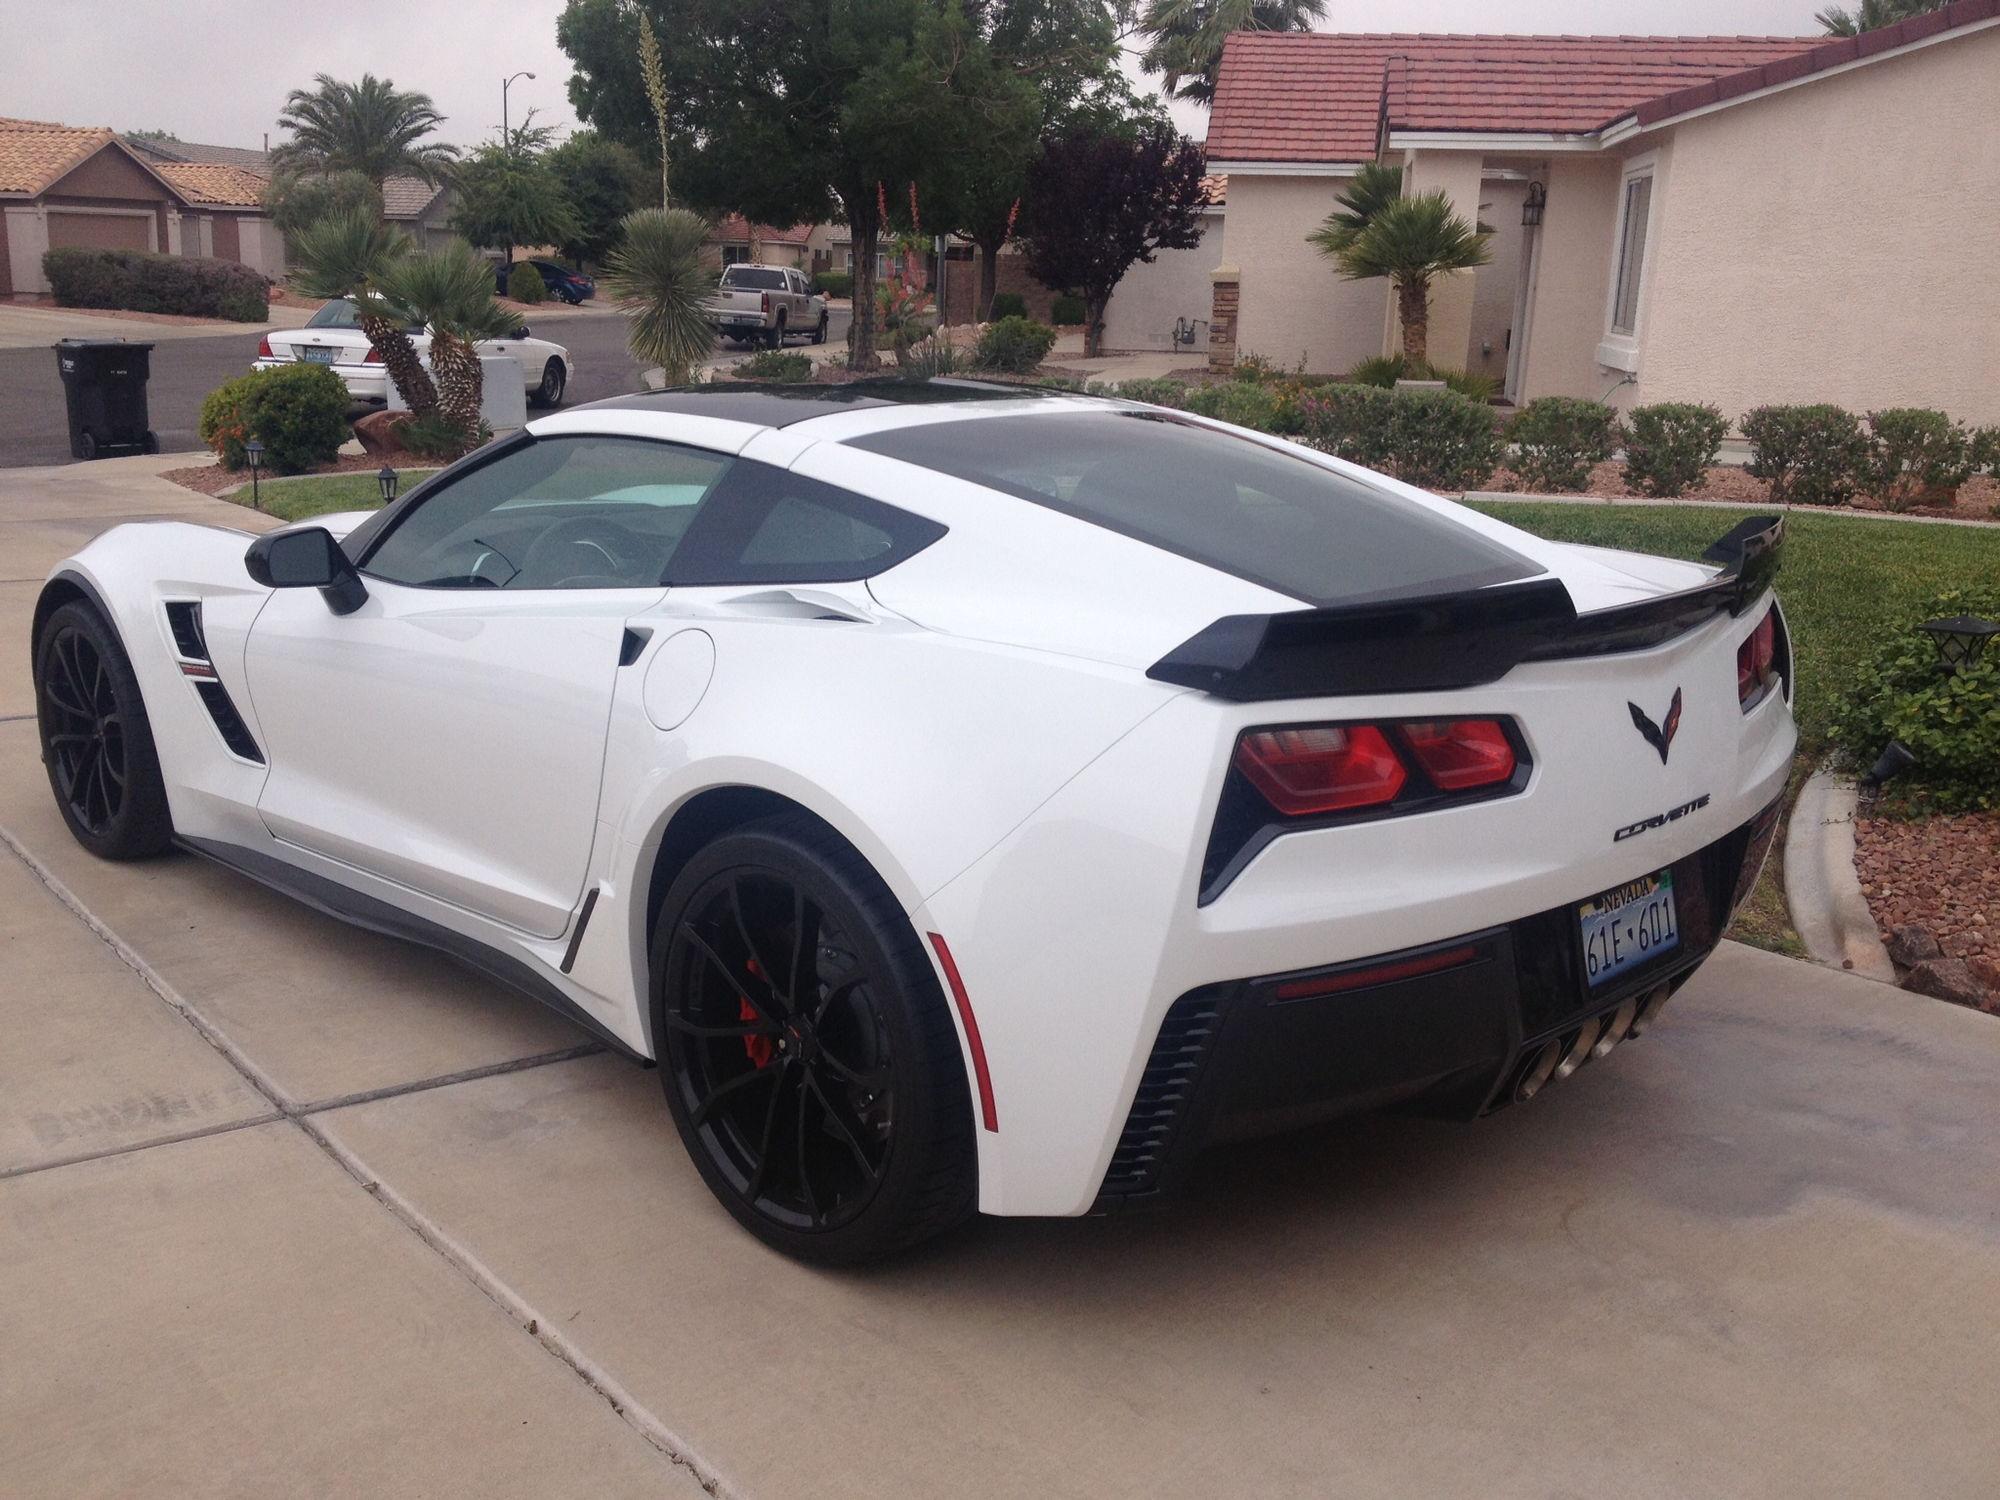 fs for sale 2017 grand sport c7 2lt artic white 265 miles corvetteforum chevrolet. Black Bedroom Furniture Sets. Home Design Ideas